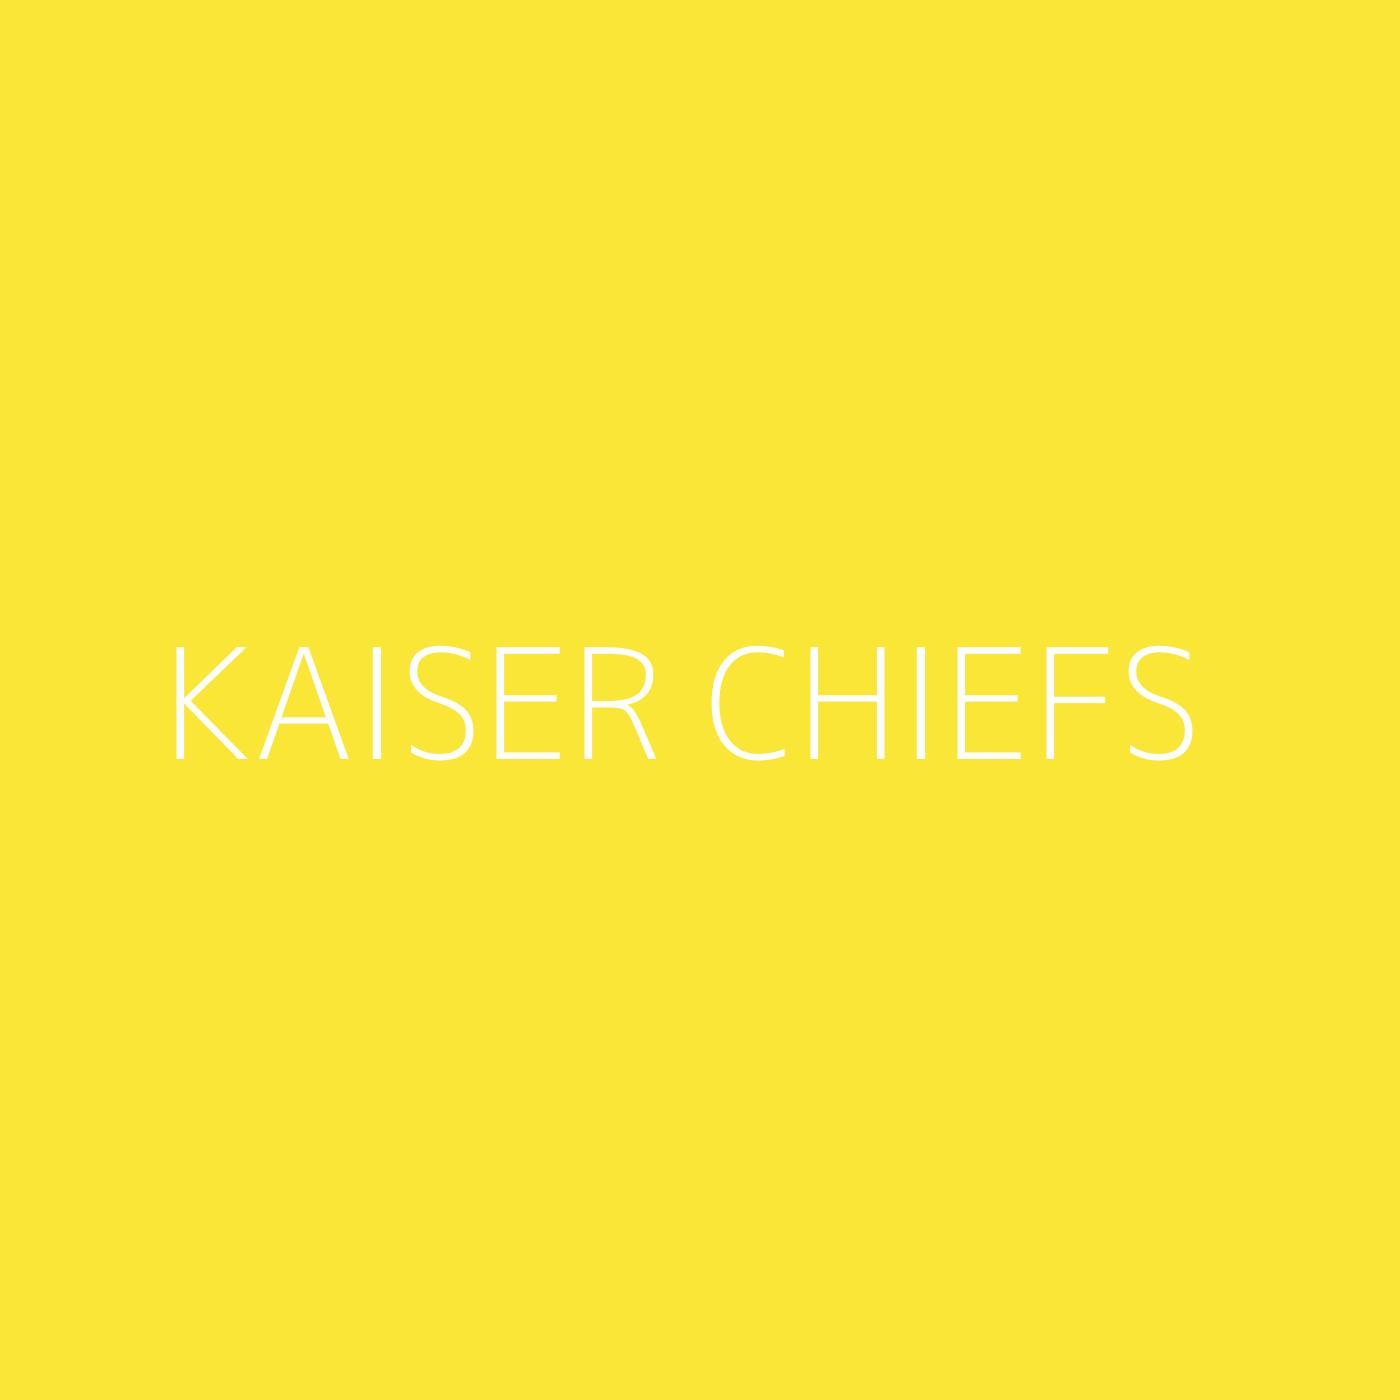 Kaiser Chiefs Playlist Artwork